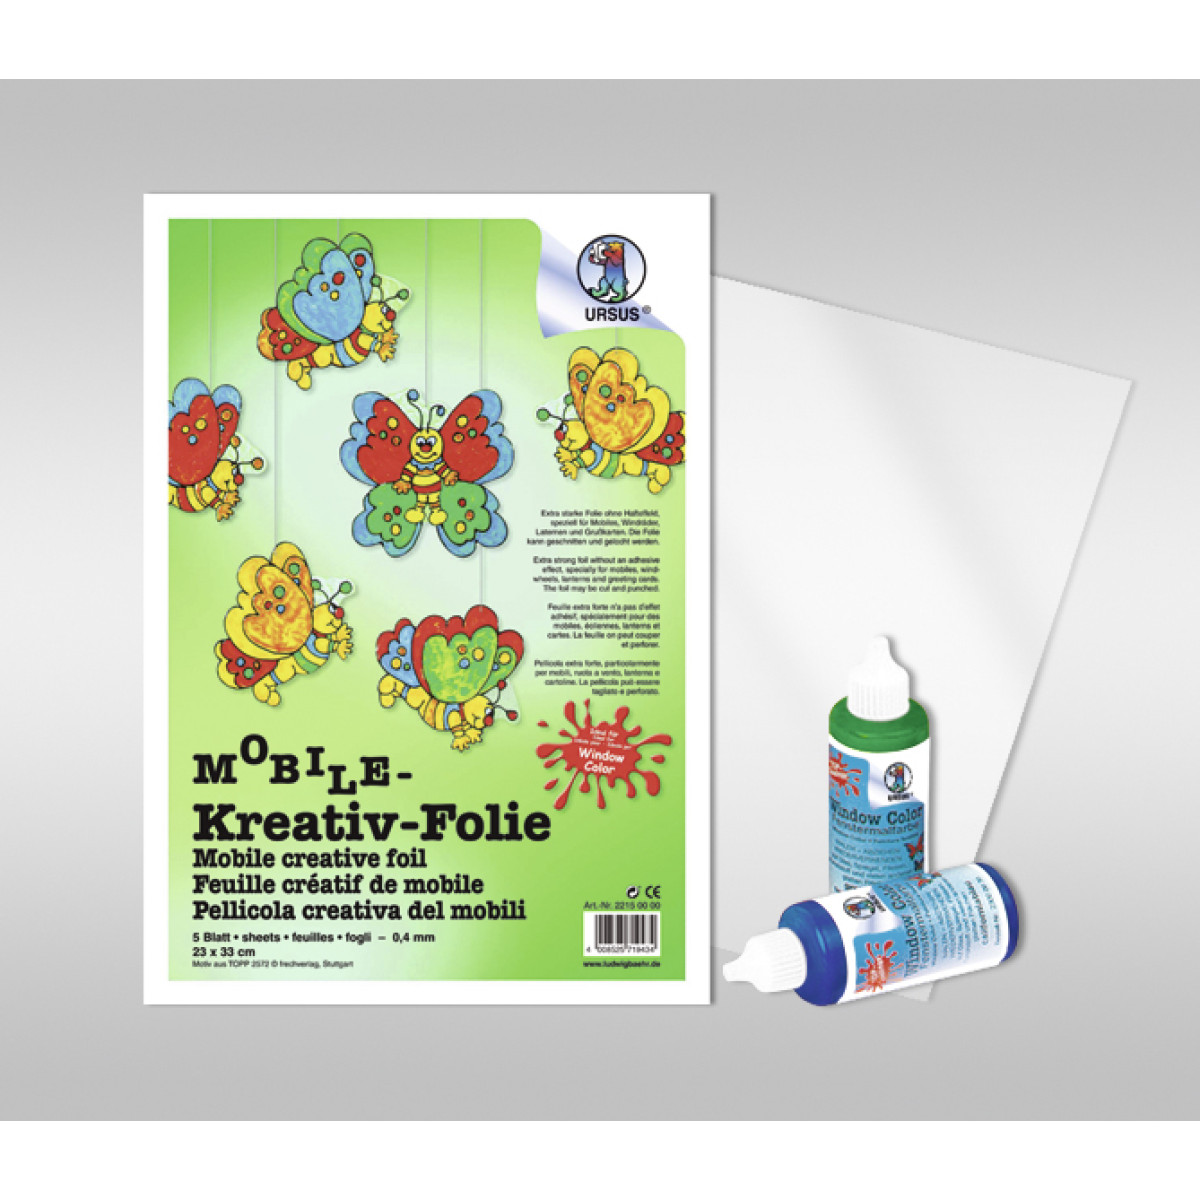 Mobile-Kreativ-Folie 50 x 70 cm - 5 Bogen